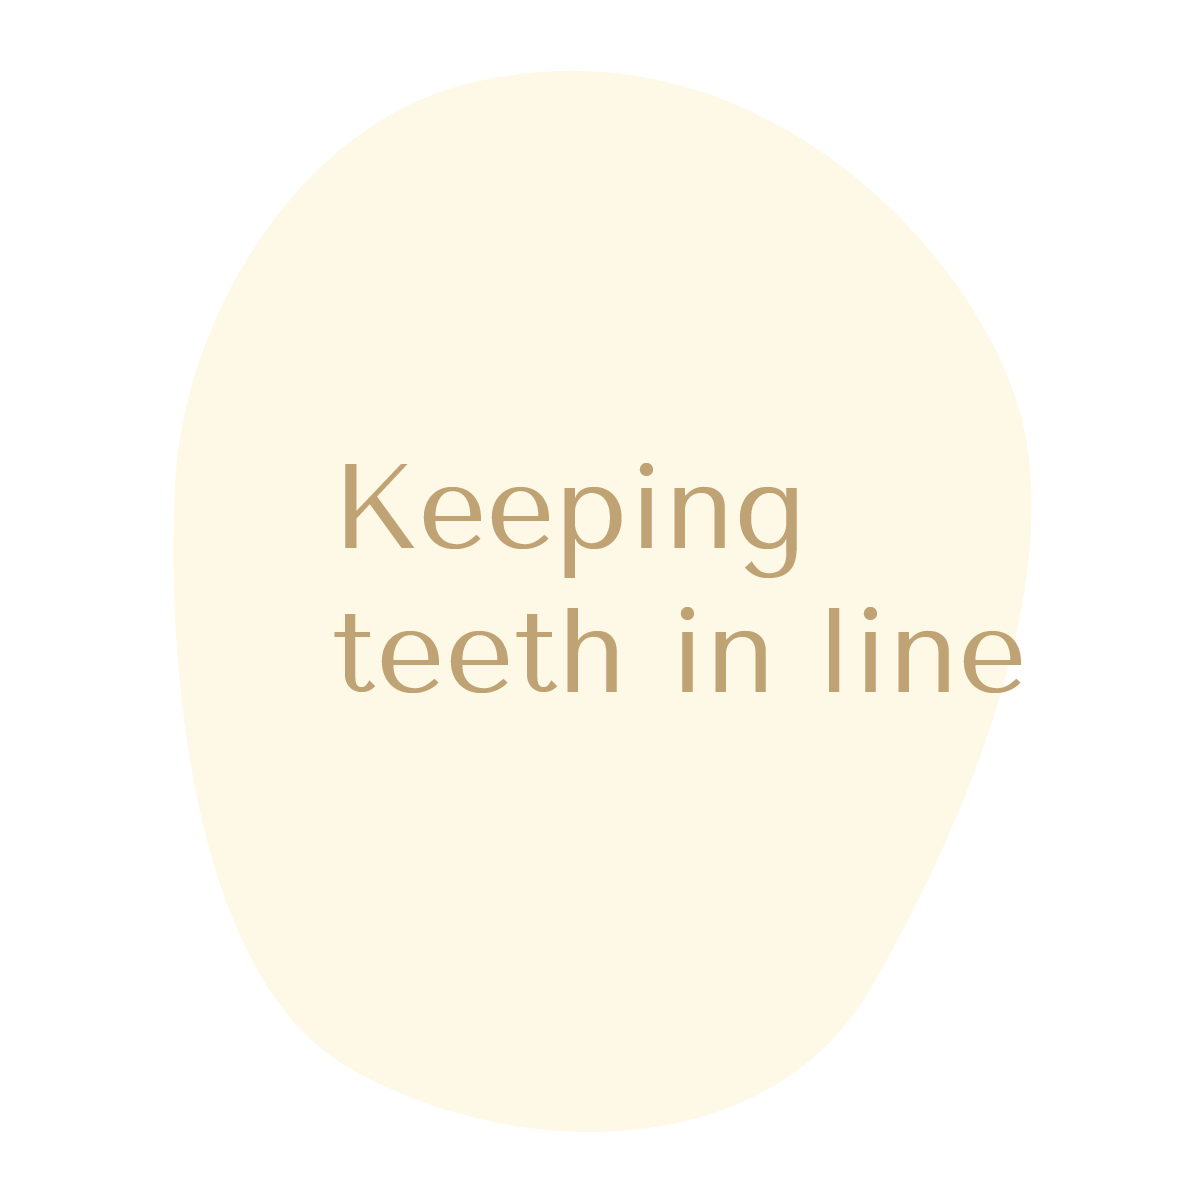 surry hills dental orthodontics quote